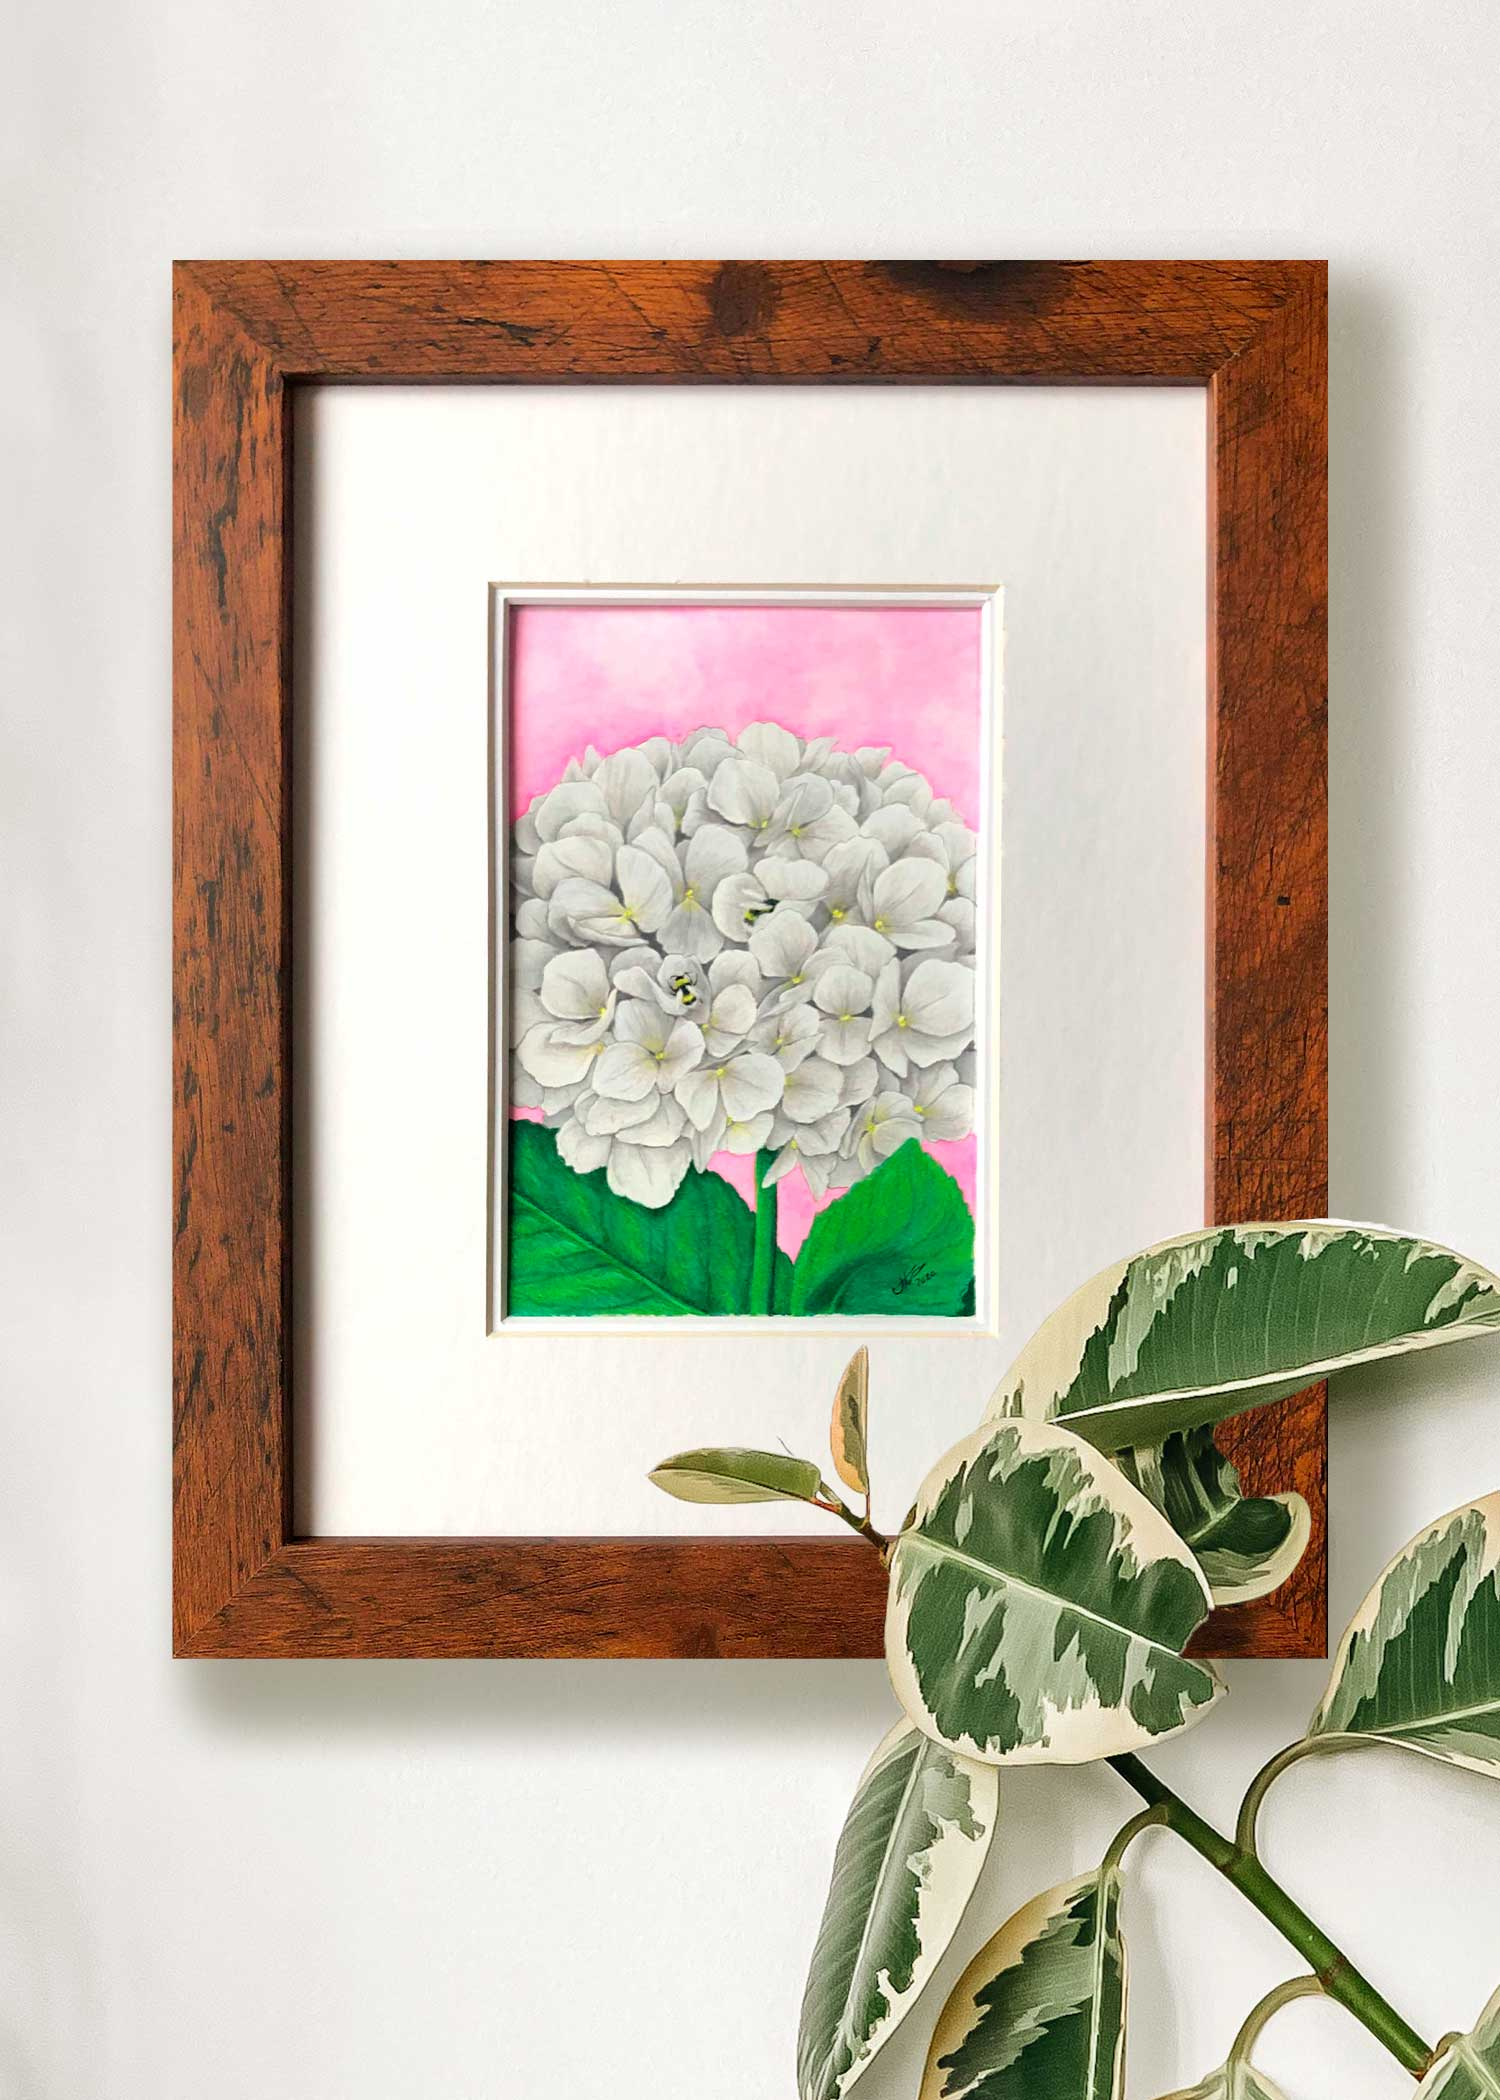 Framed White Hydrangea Painting